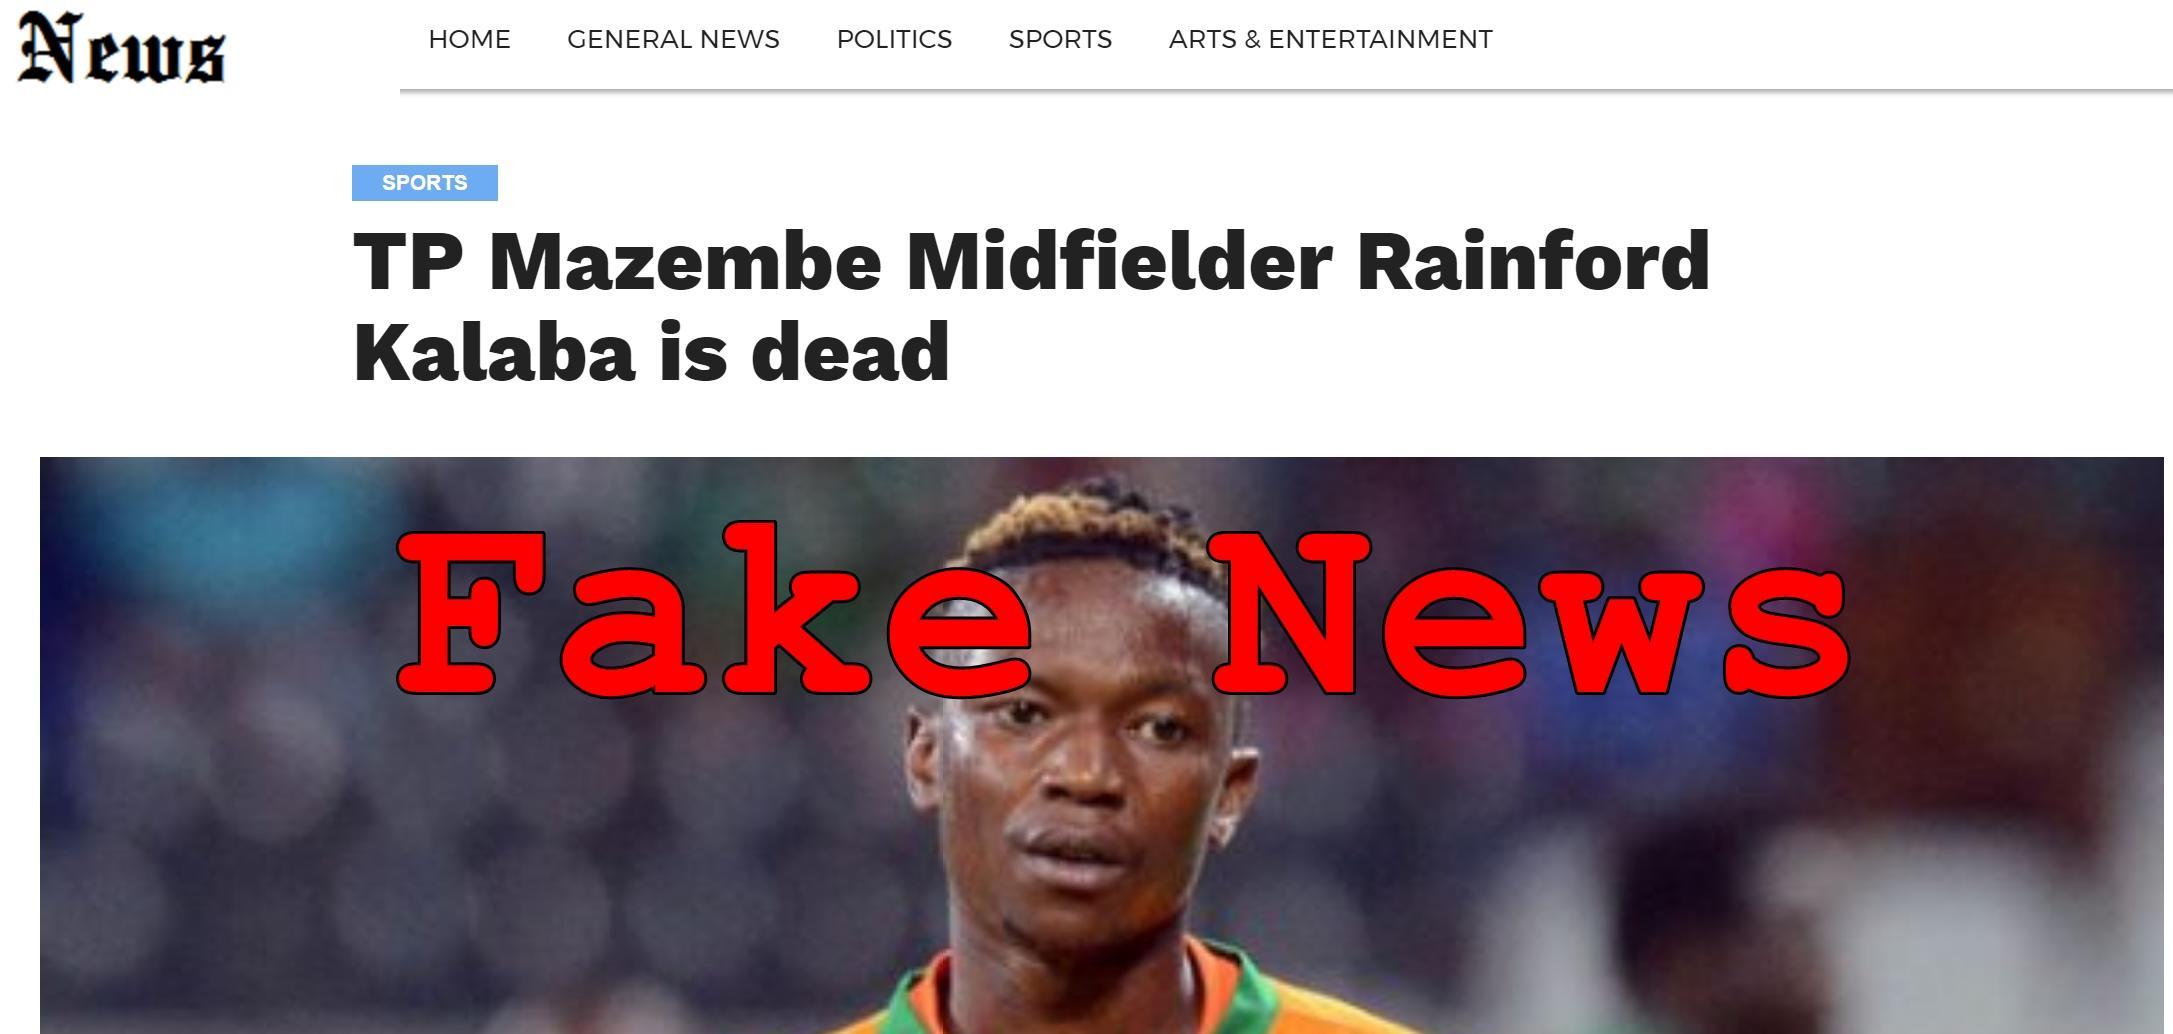 Fake News: TP Mazembe Midfielder Rainford Kalaba Is NOT Dead